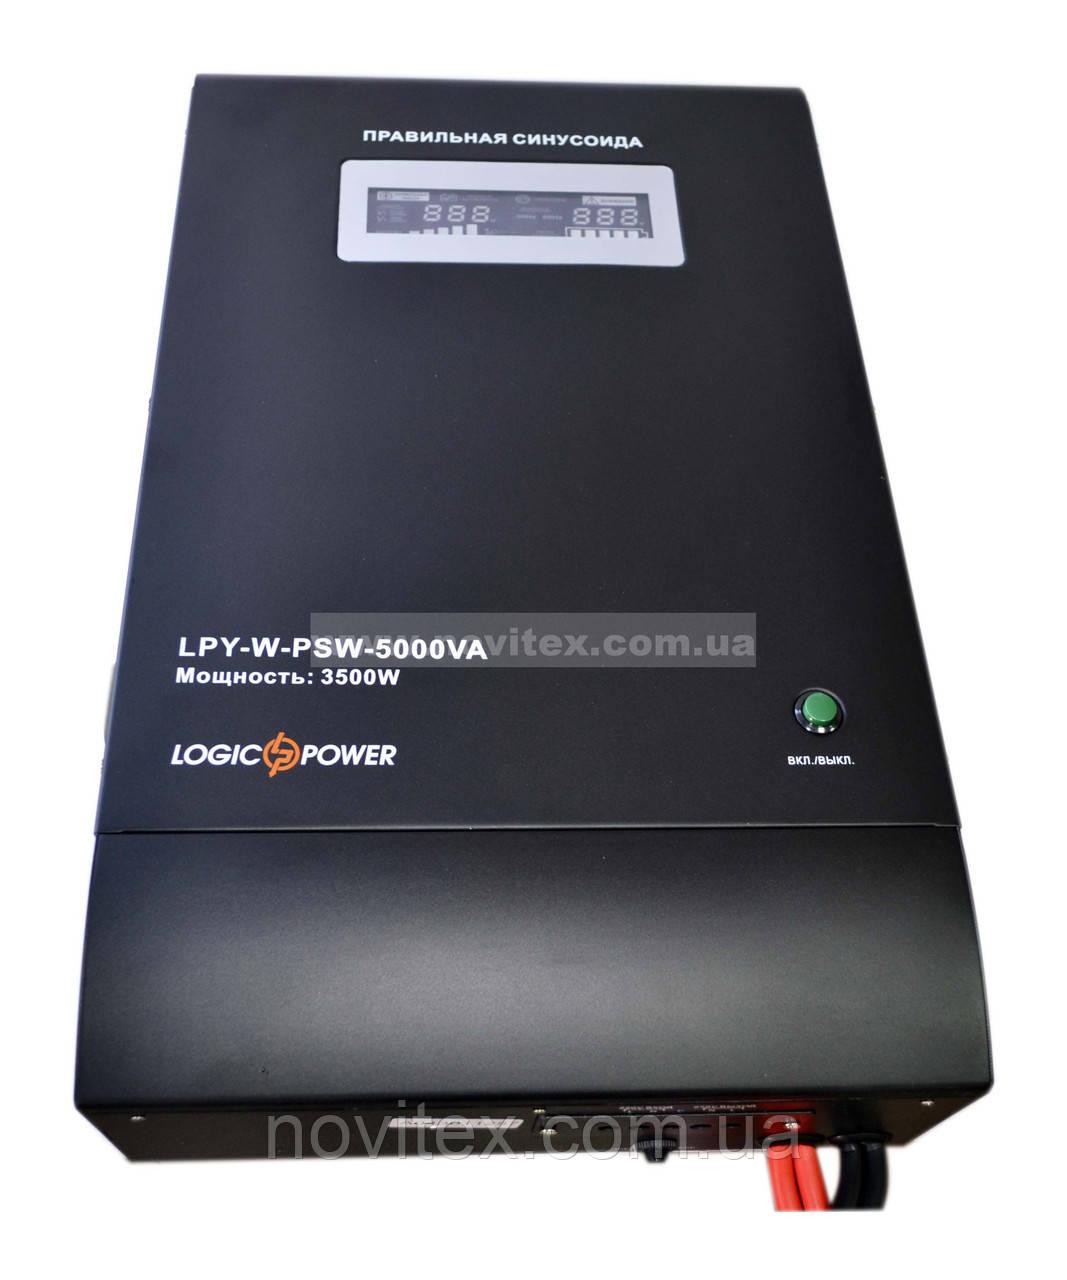 ИБП Logicpower LPY-W-PSW-5000+ (3500Вт) 48V